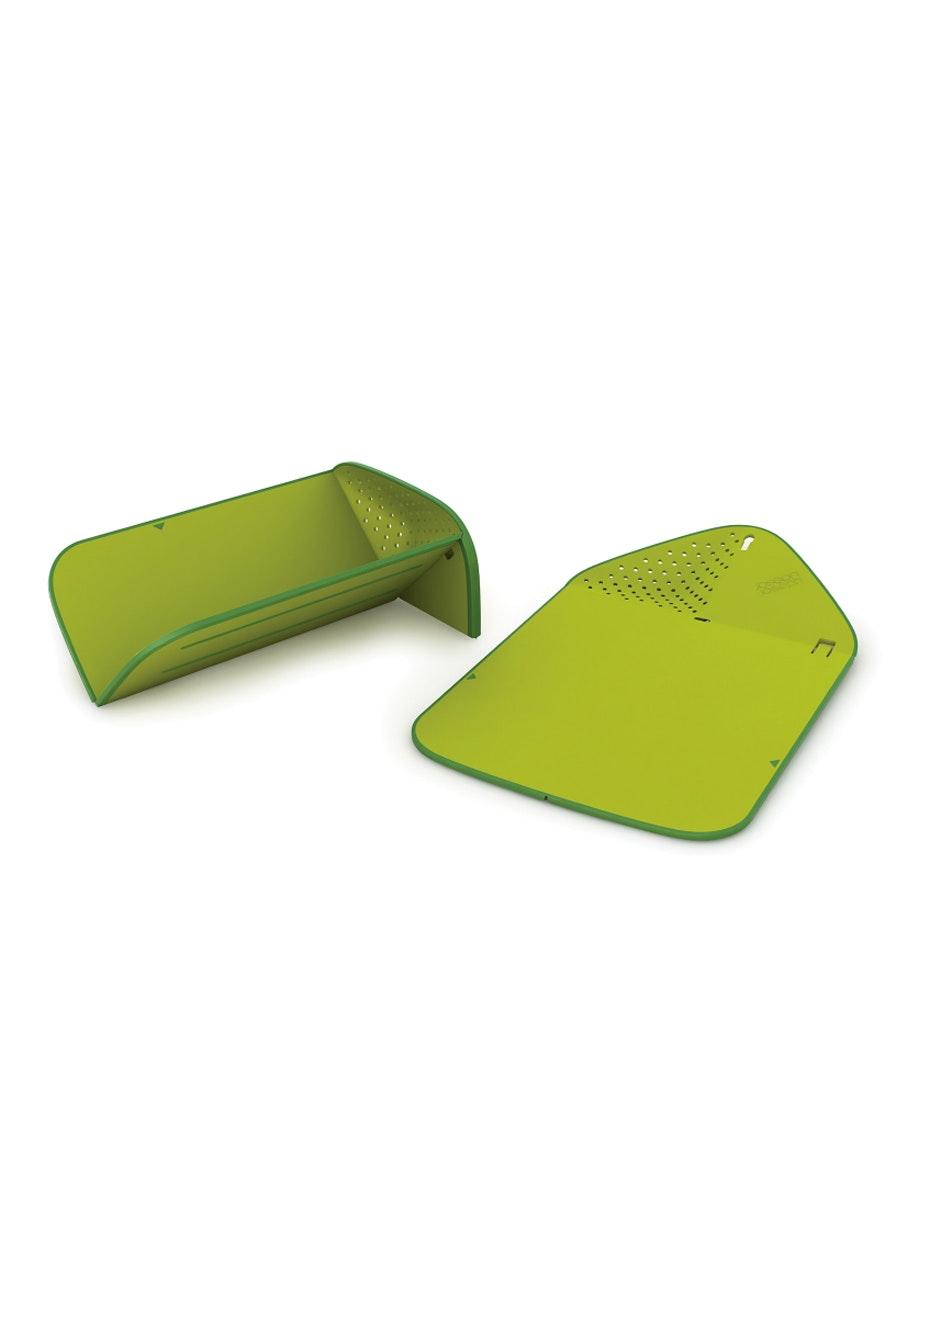 Joseph Joseph - Rinse&Chop™ Plus - Green